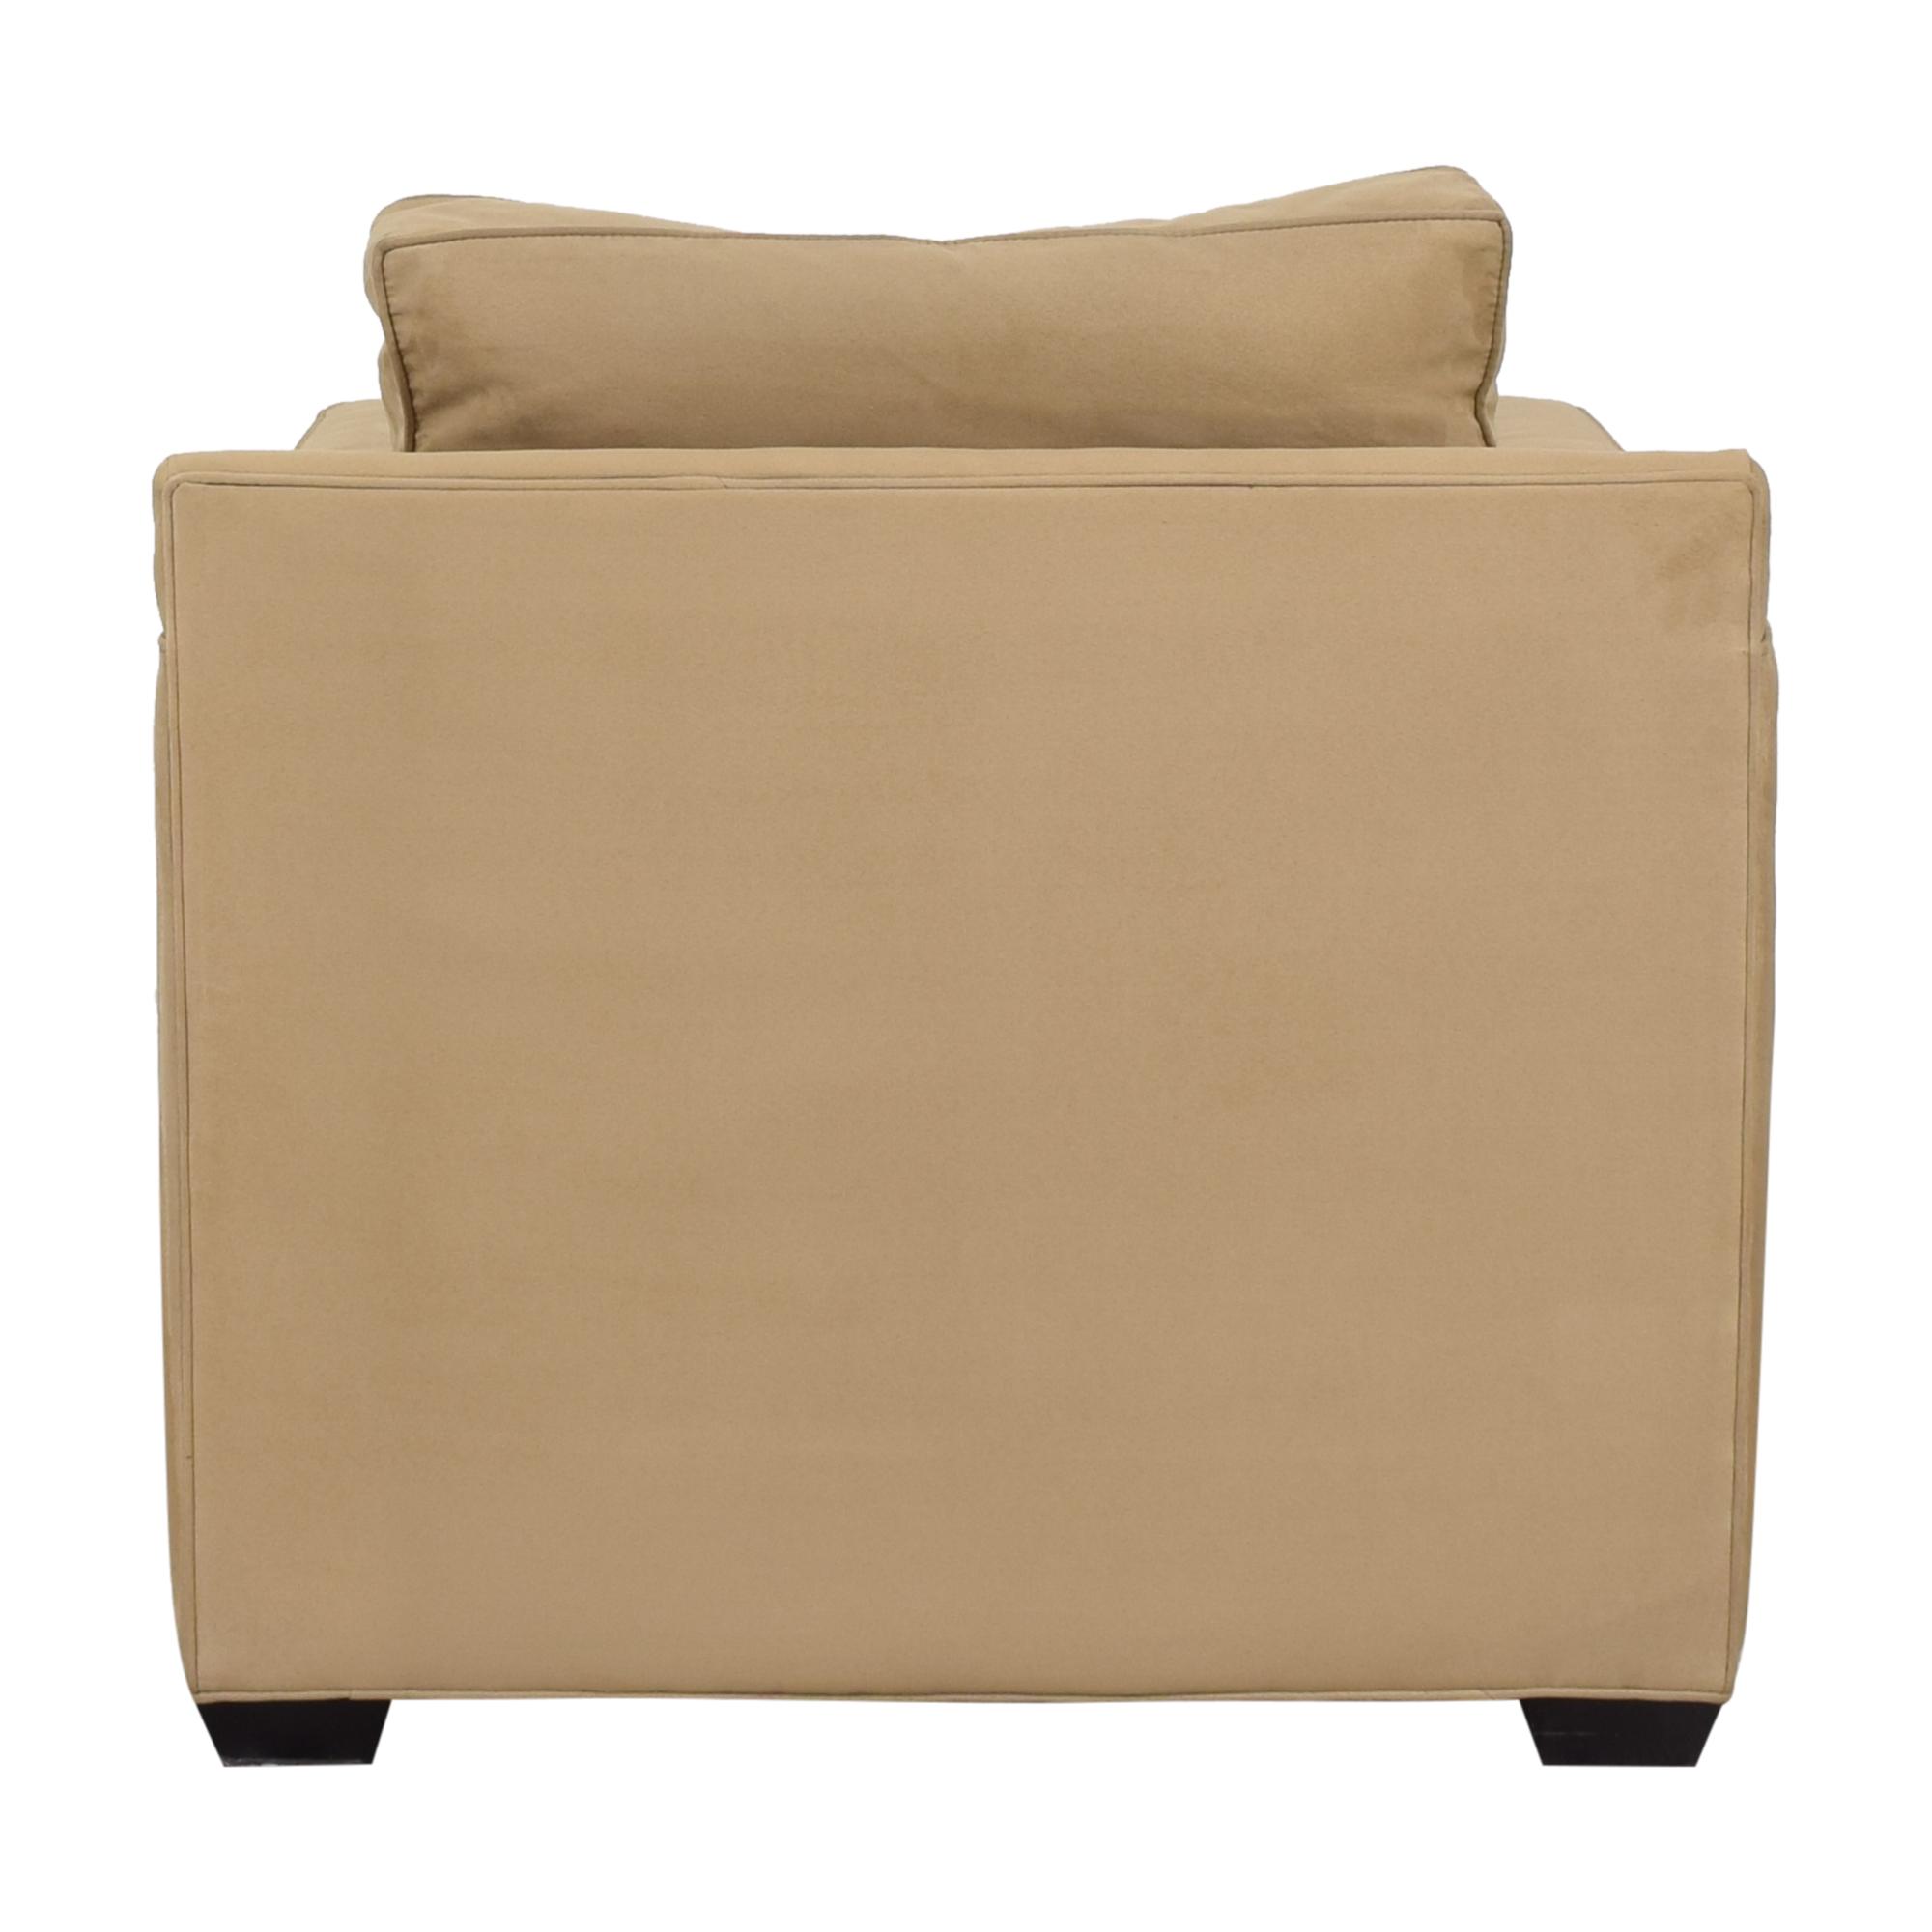 Crate & Barrel Crate & Barrel Davis Beige Accent Chair for sale